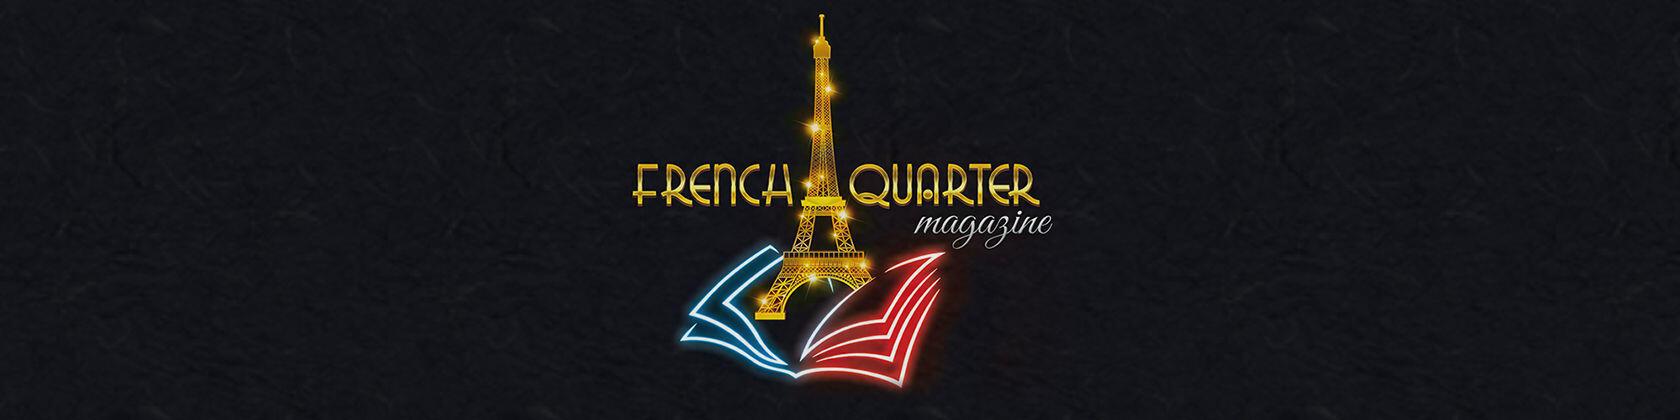 French Quarter Magazine Logo